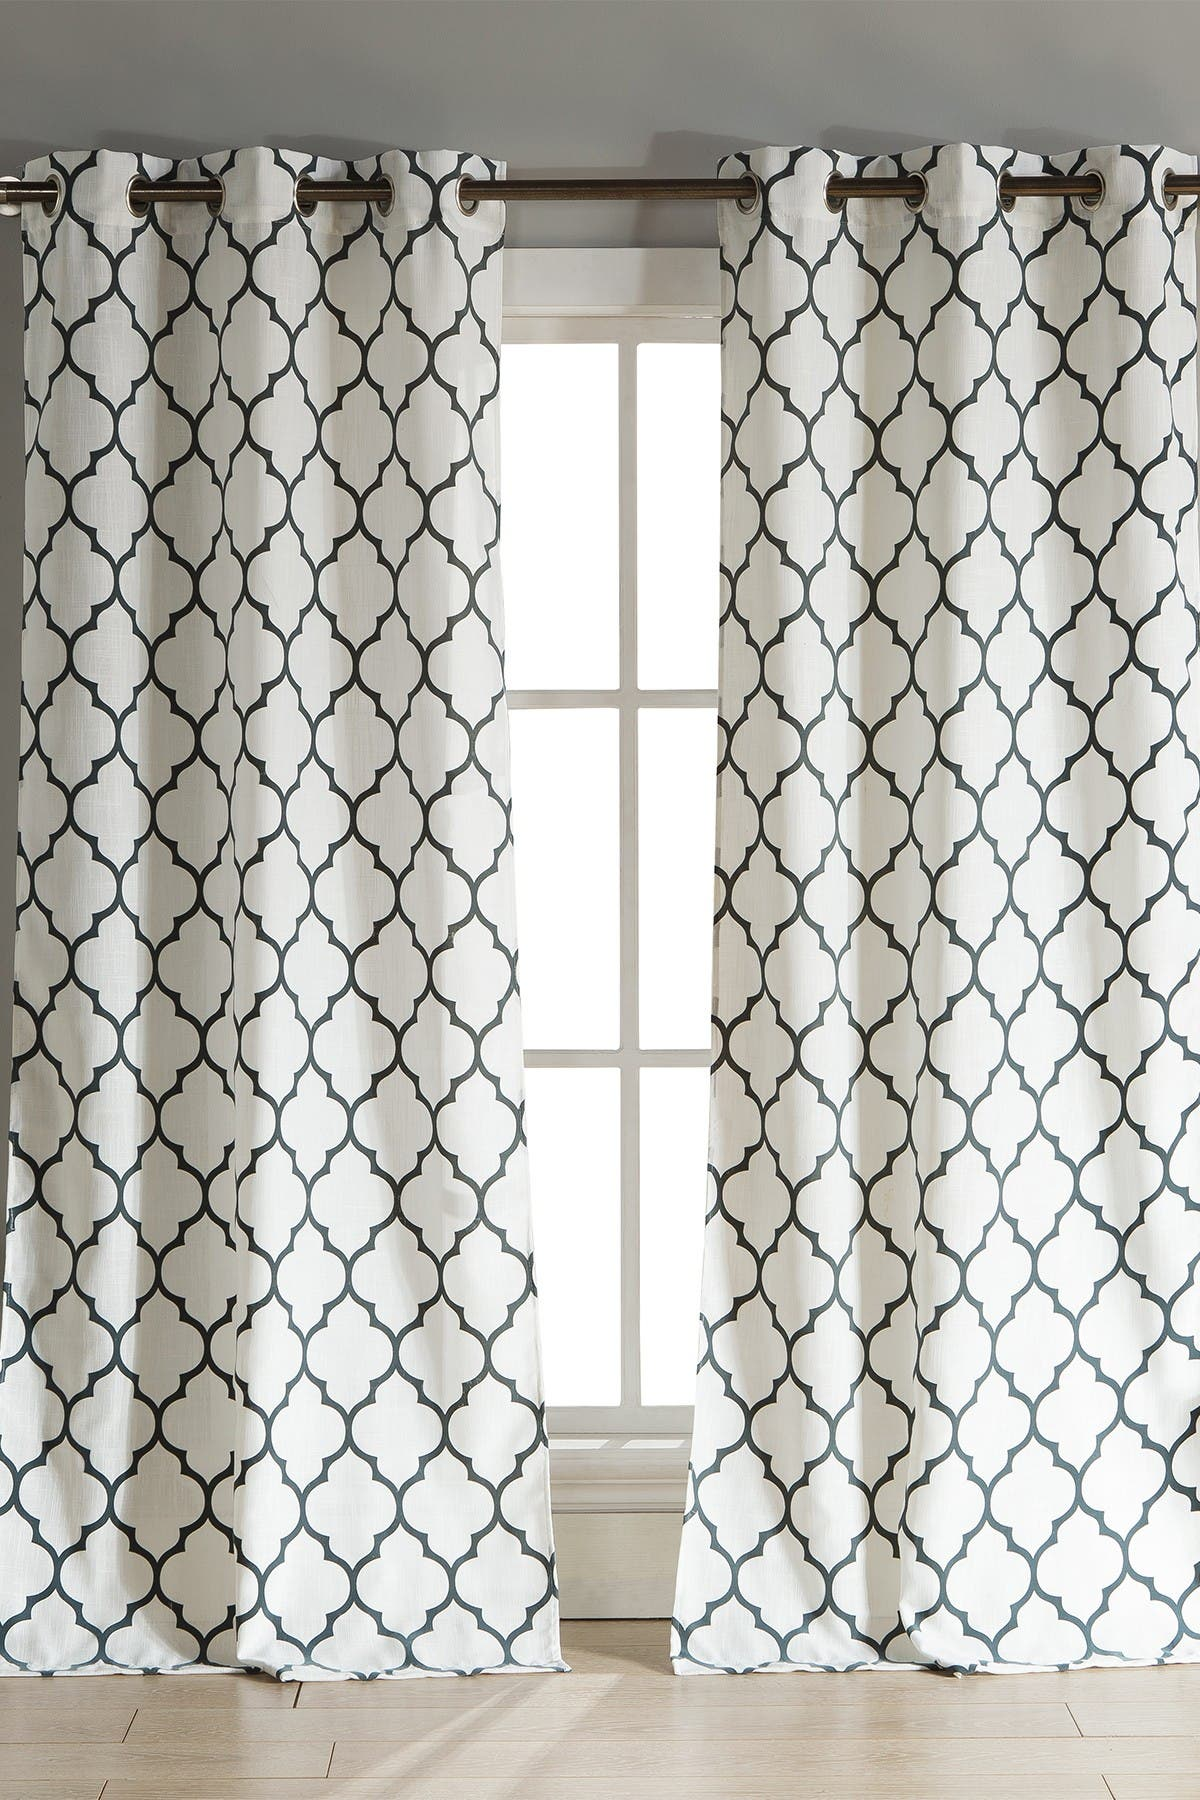 Image of Duck River Textile Mason Grommet Pair Curtain - Set of 2 - Stone/Blue